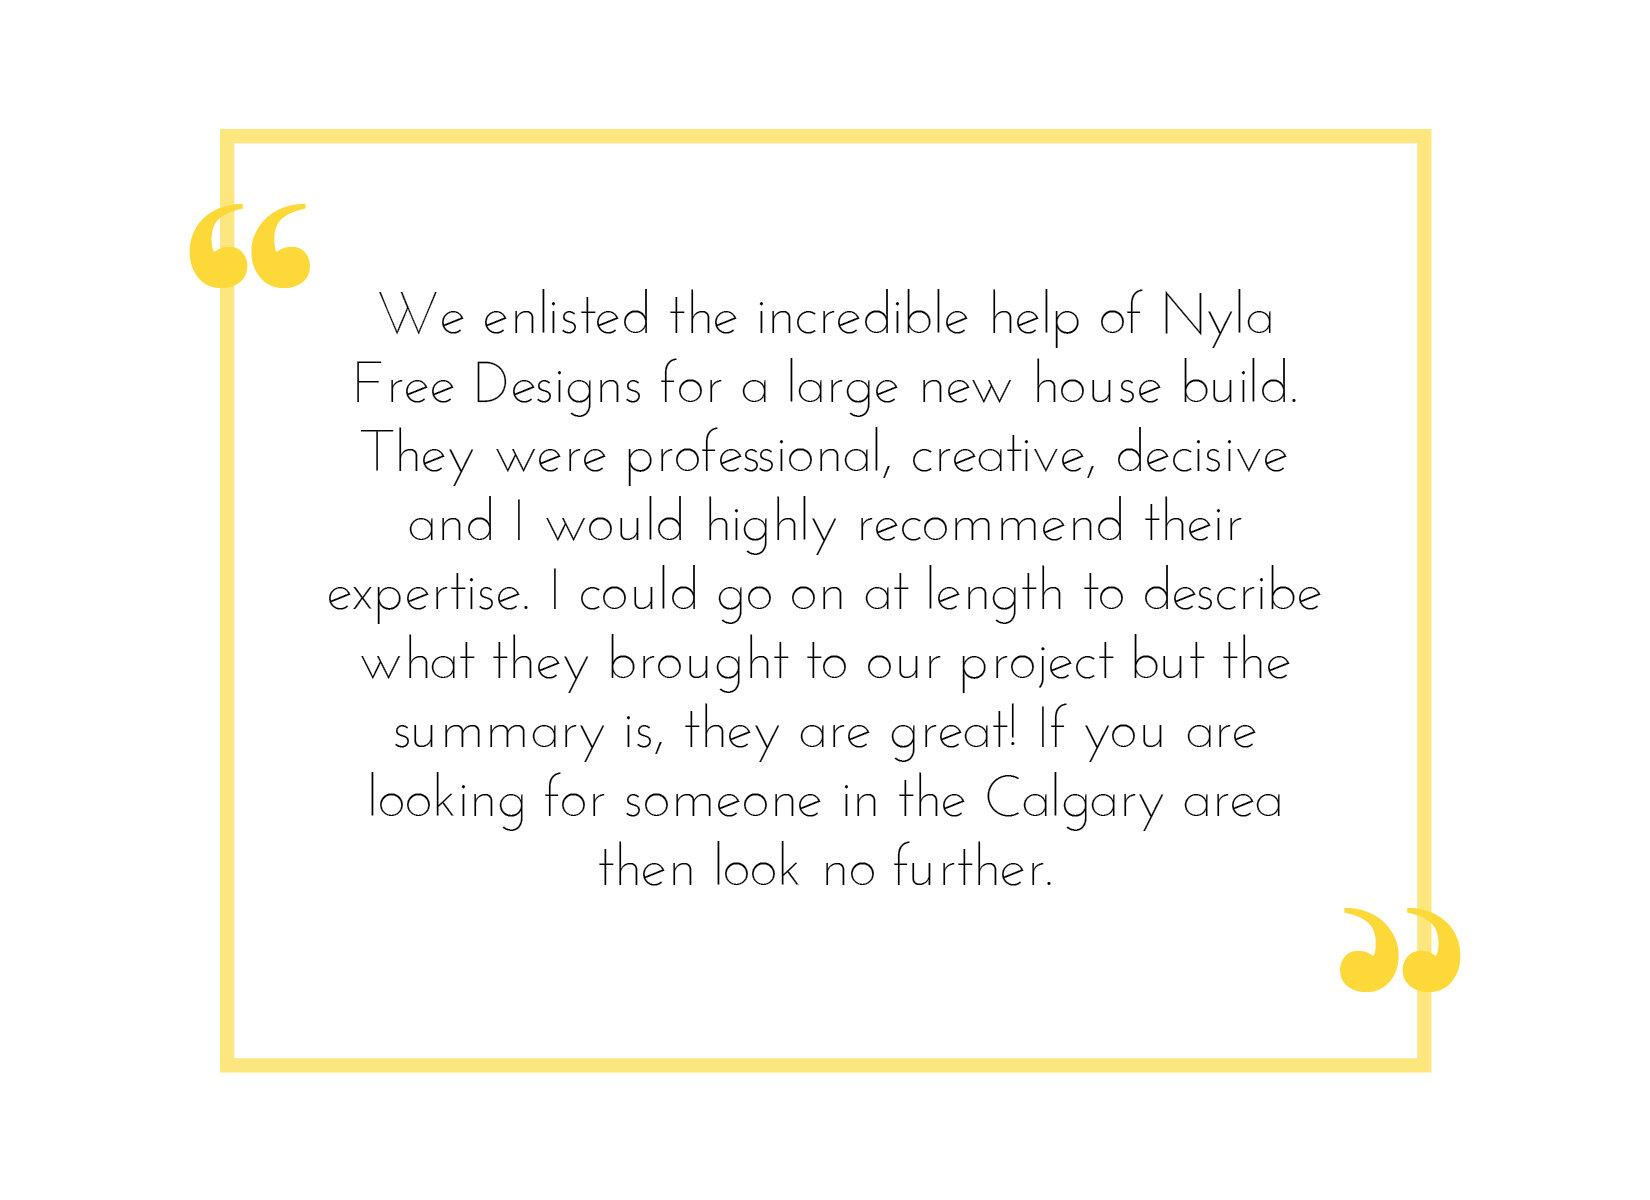 Nyla Free Designs, Accolades, Kirker